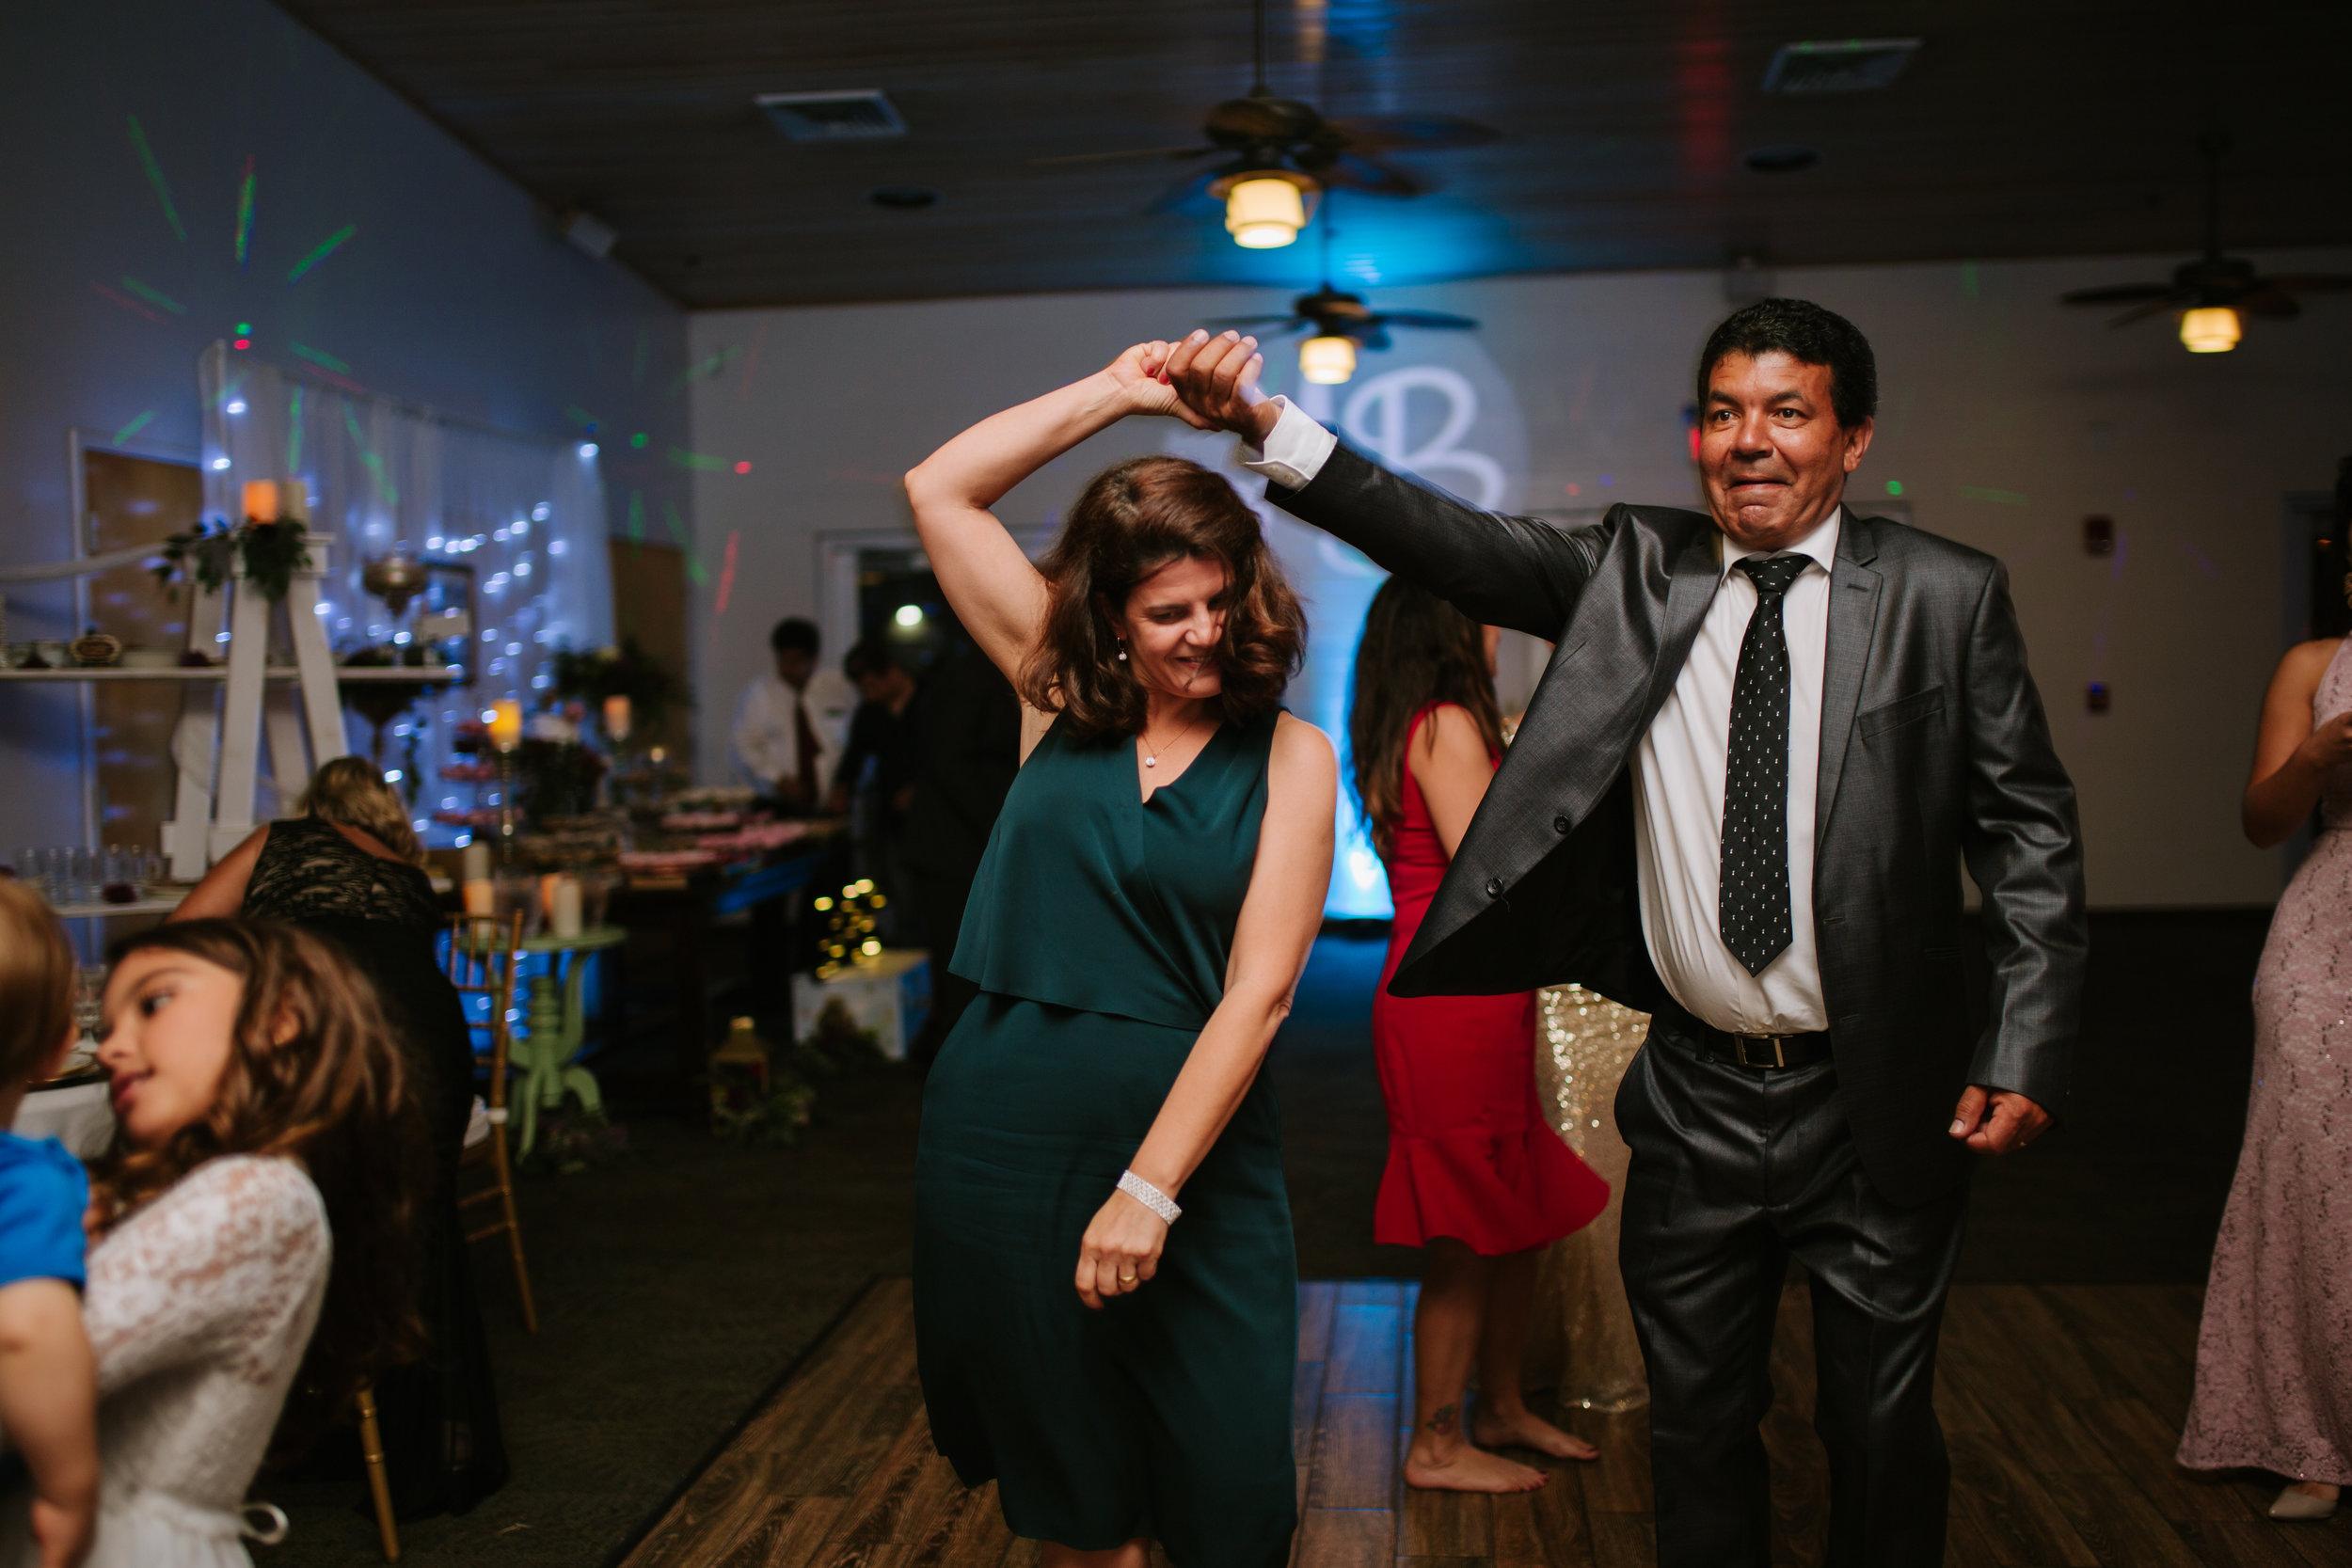 2017.05.23 Barbara and Mauricio Sales Port St Lucie Wedding (699 of 772).jpg